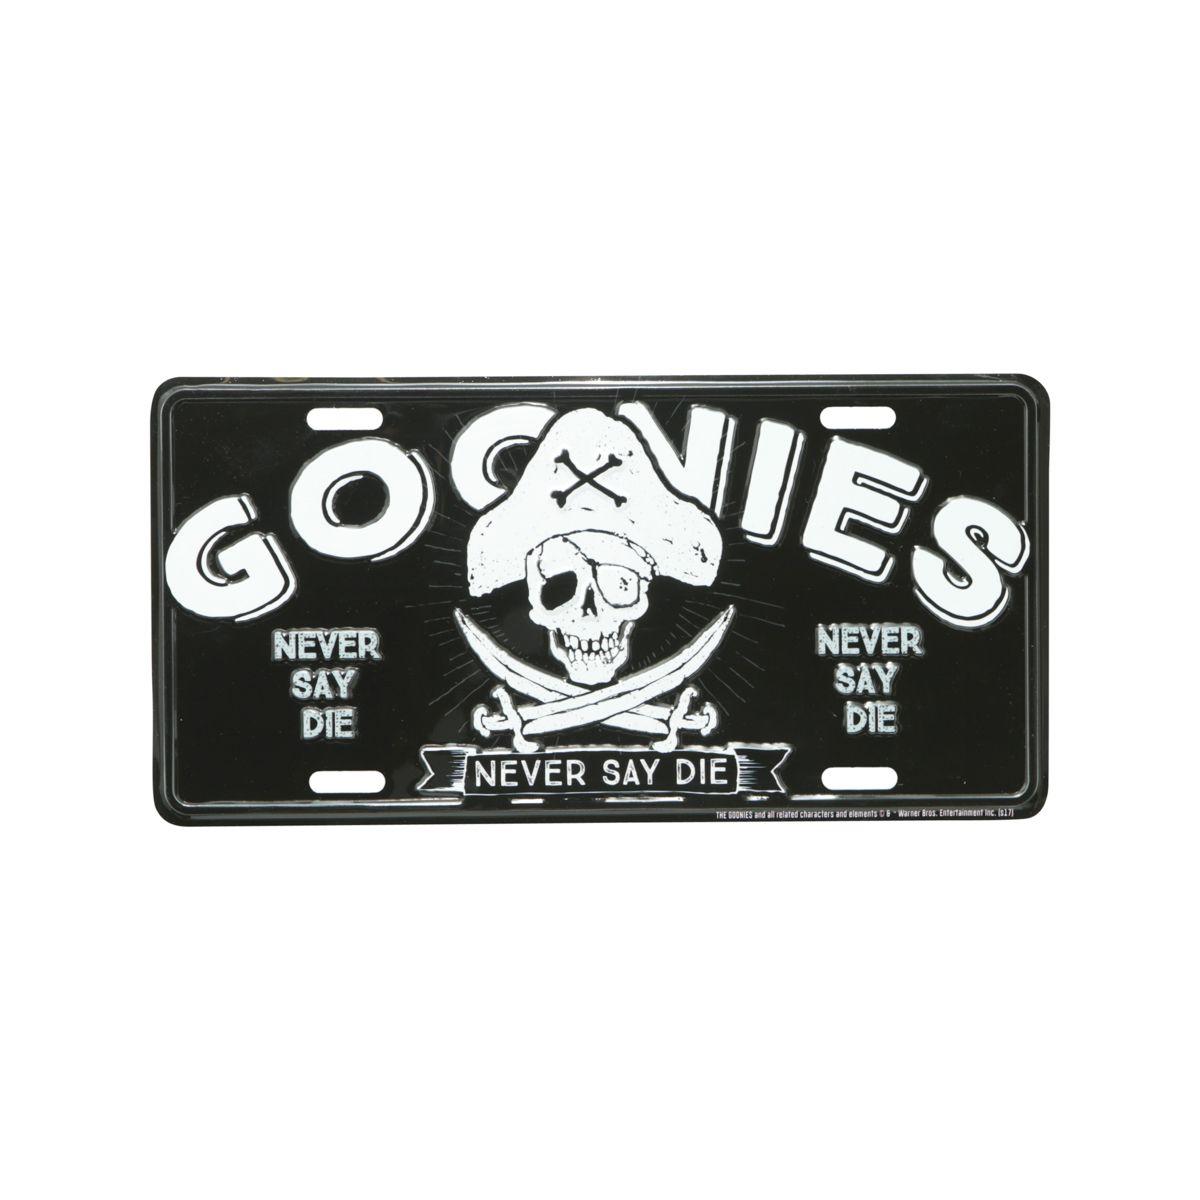 Placa de Carro Os Goonies (The Goonies) Preto: Os Goonies (The Goonies) - Urban